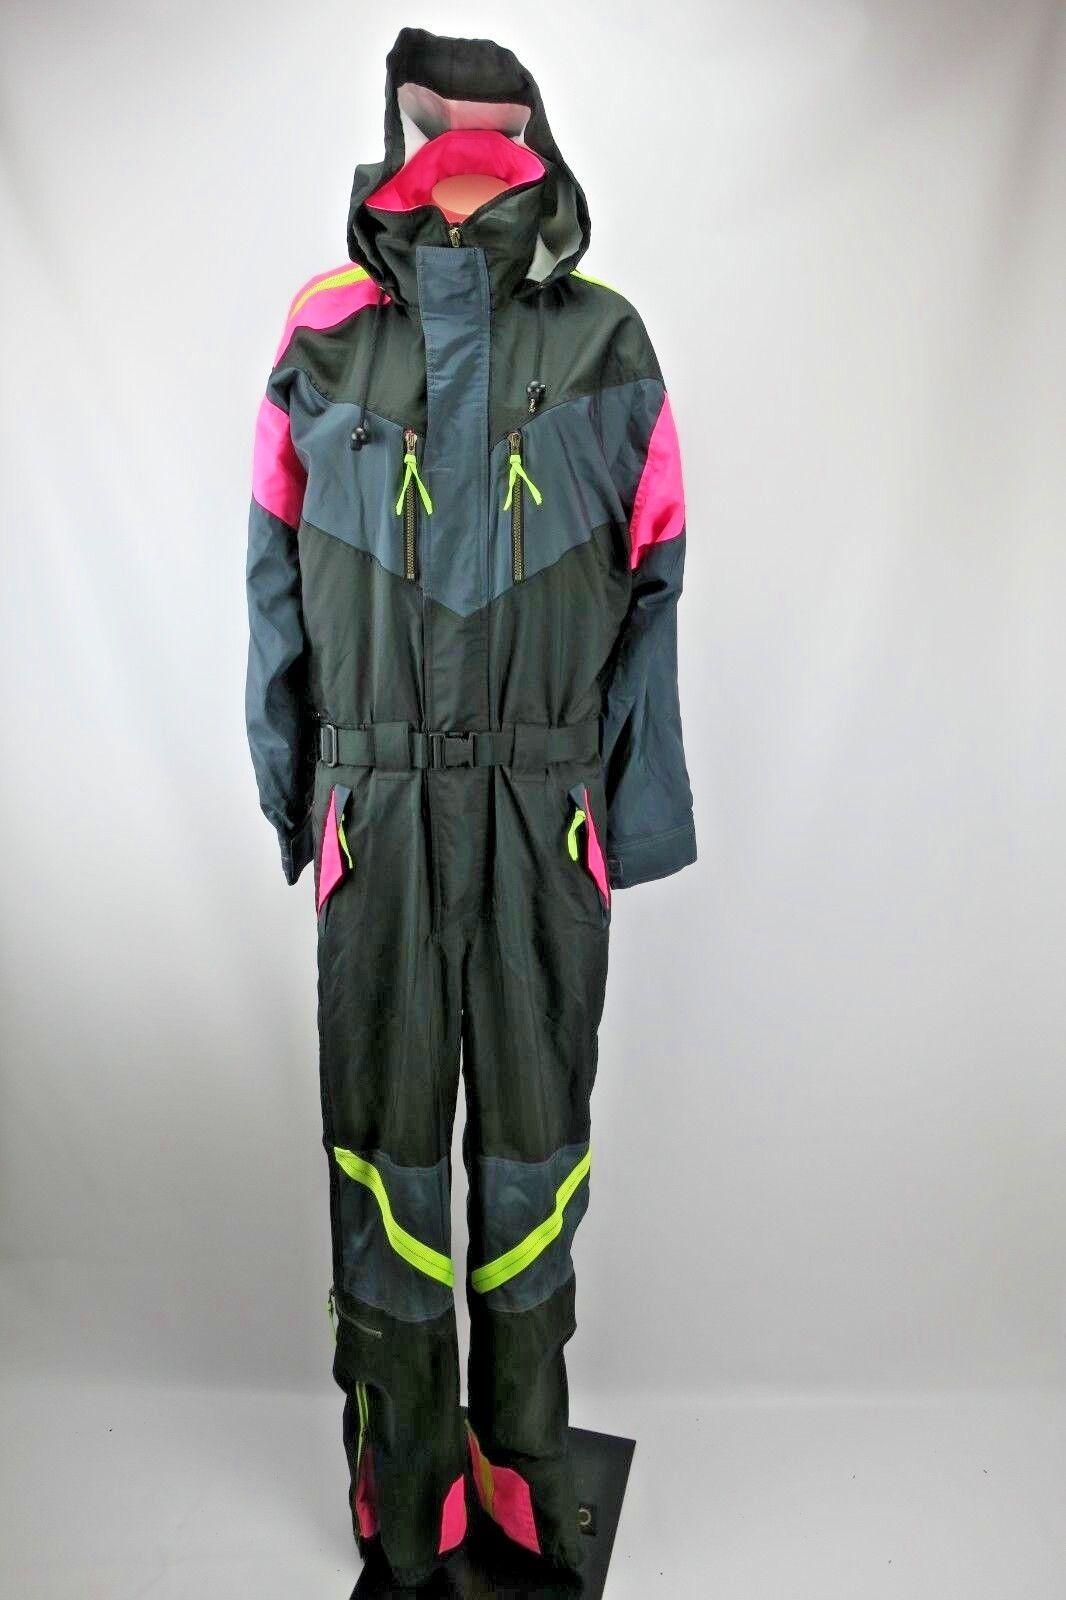 VTG JD Sun Valley Neon schwarz Ski snow suit sz S Jumpsuit Belted FarbeBLOCK